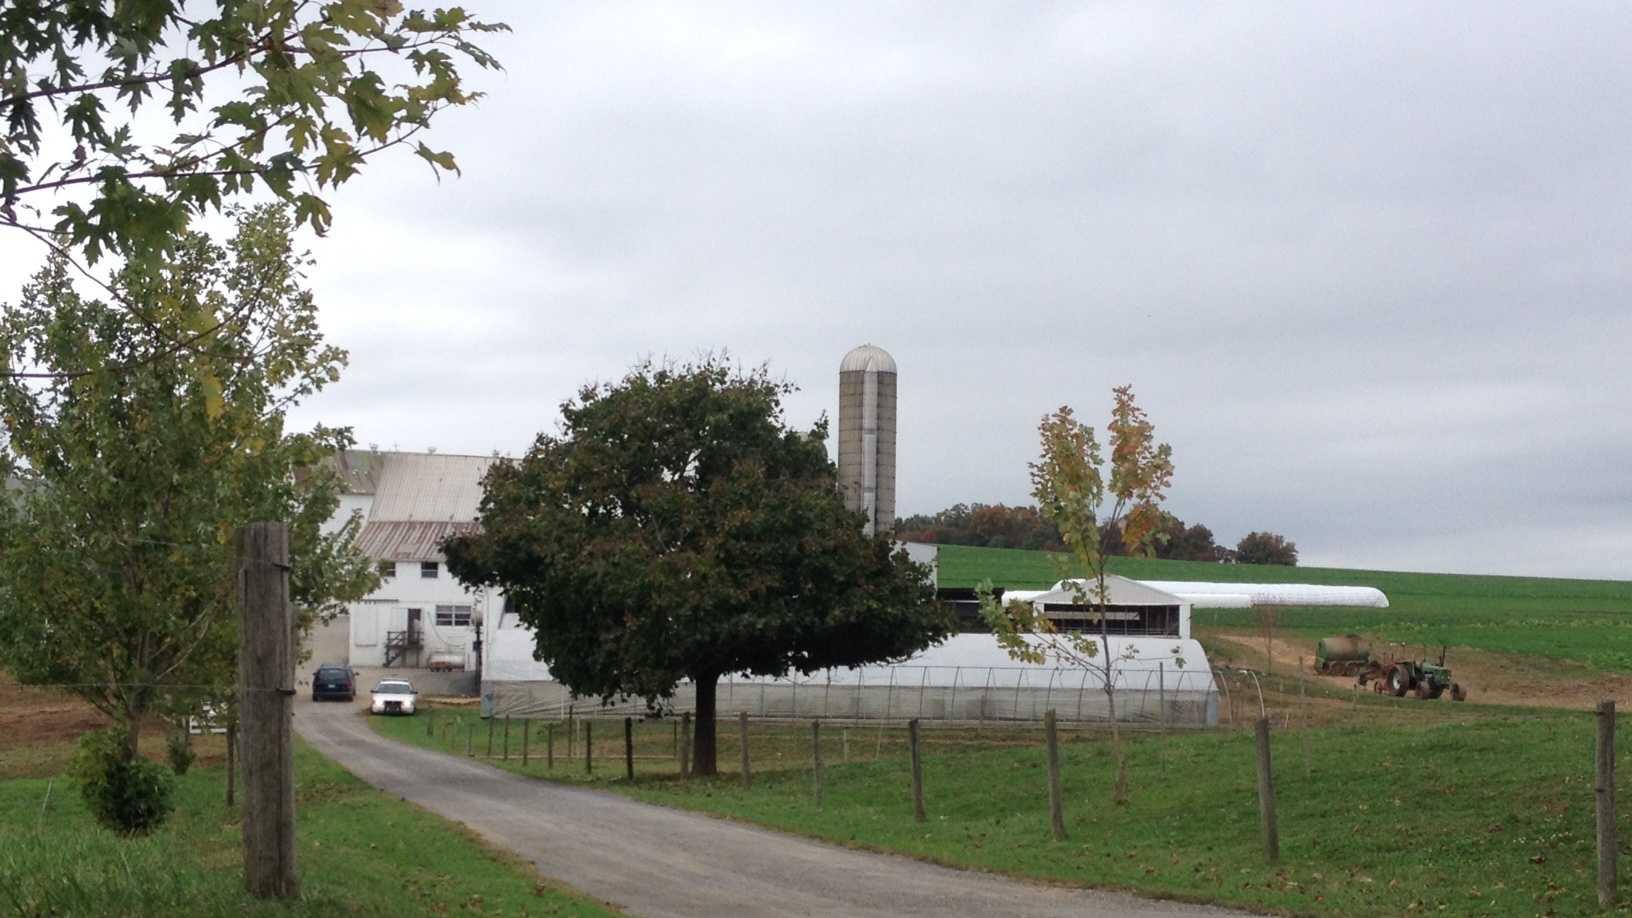 10.16.13 fatal farm accident